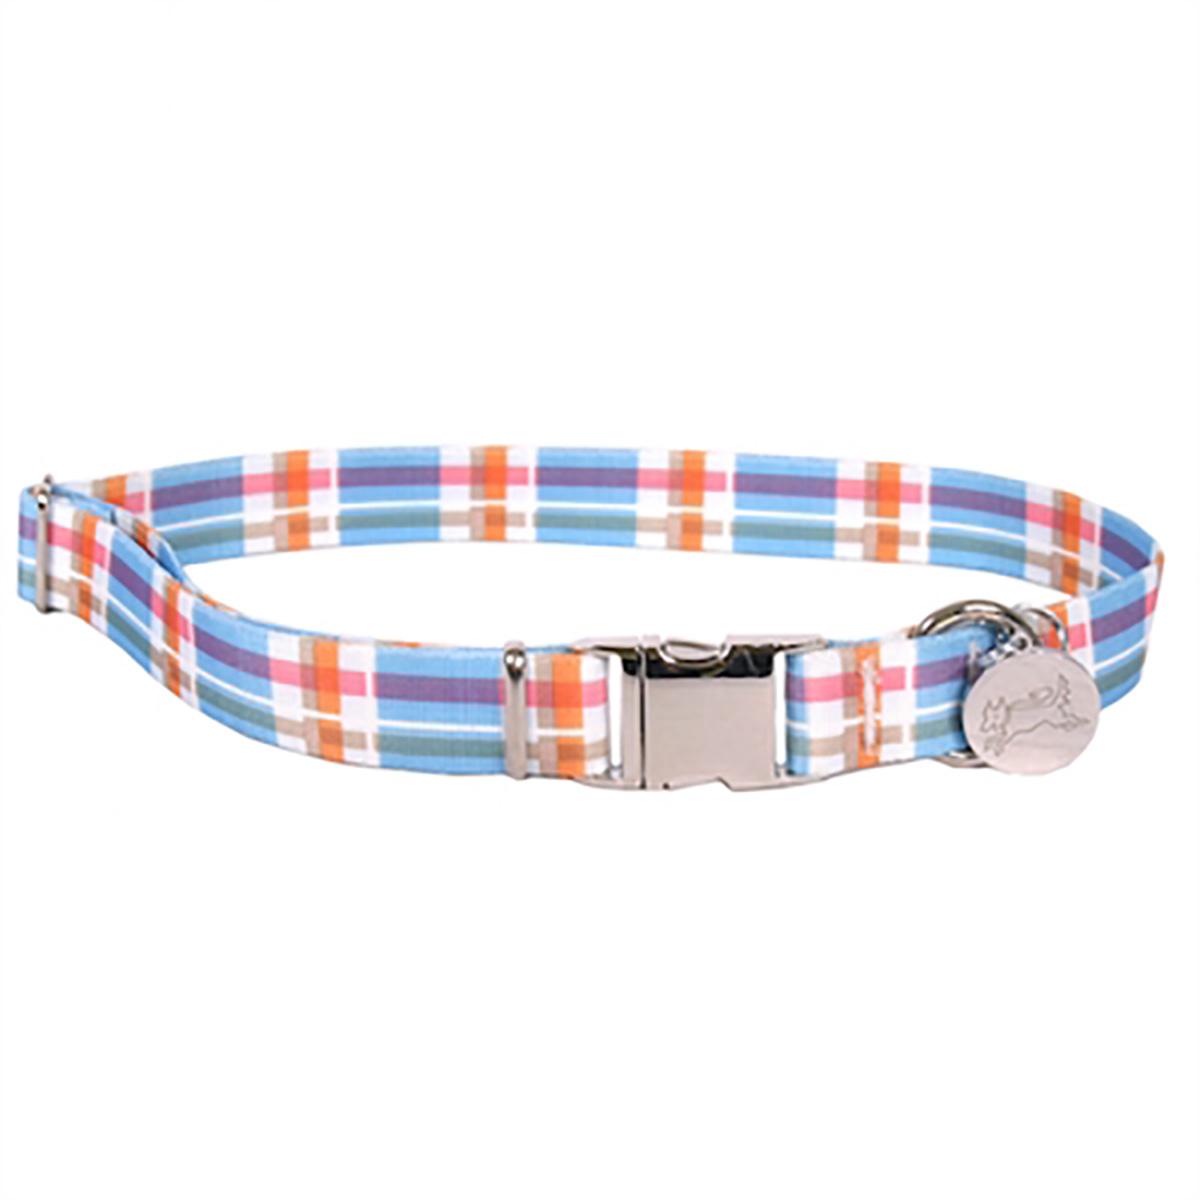 Southern Dawg Madras Dog Collar by Yellow Dog - Blue